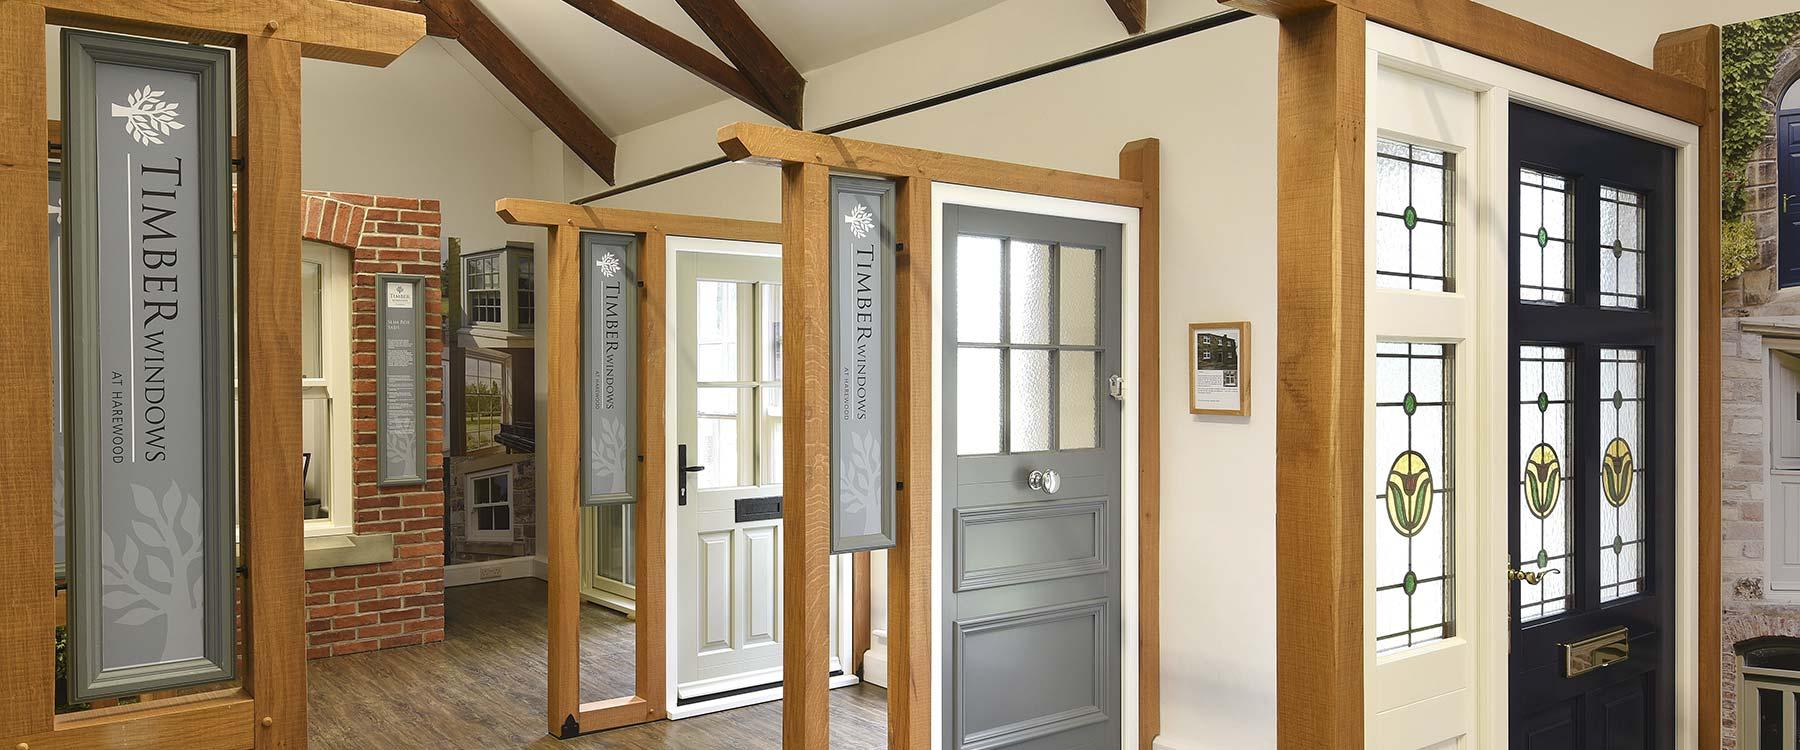 Yorkshire Timber Windows showroom